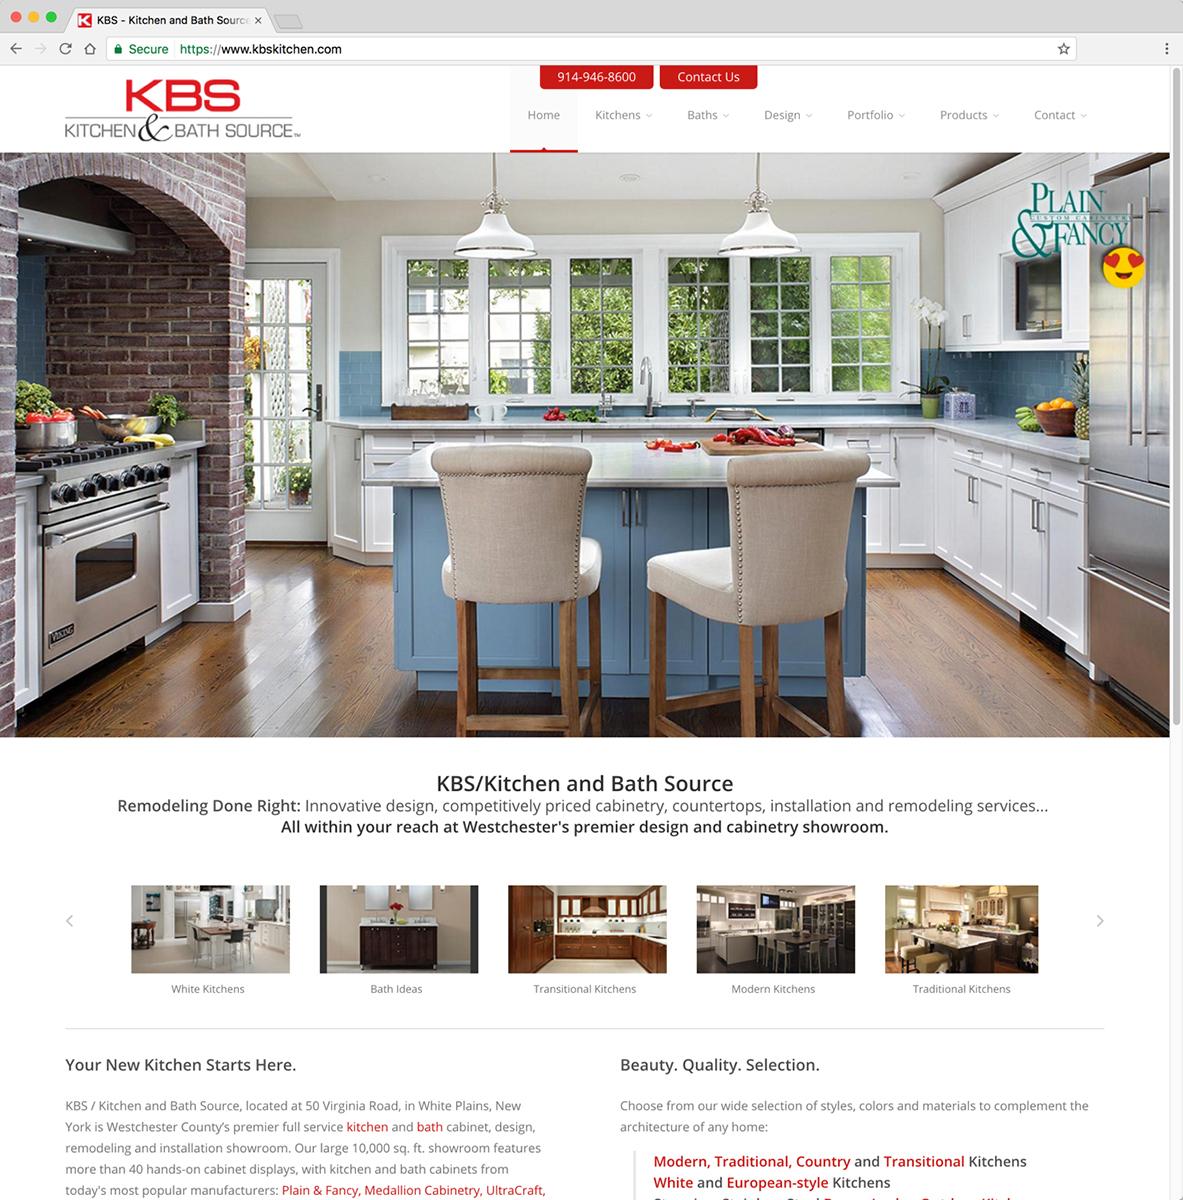 KBS/Kitchen and Bath Source Website